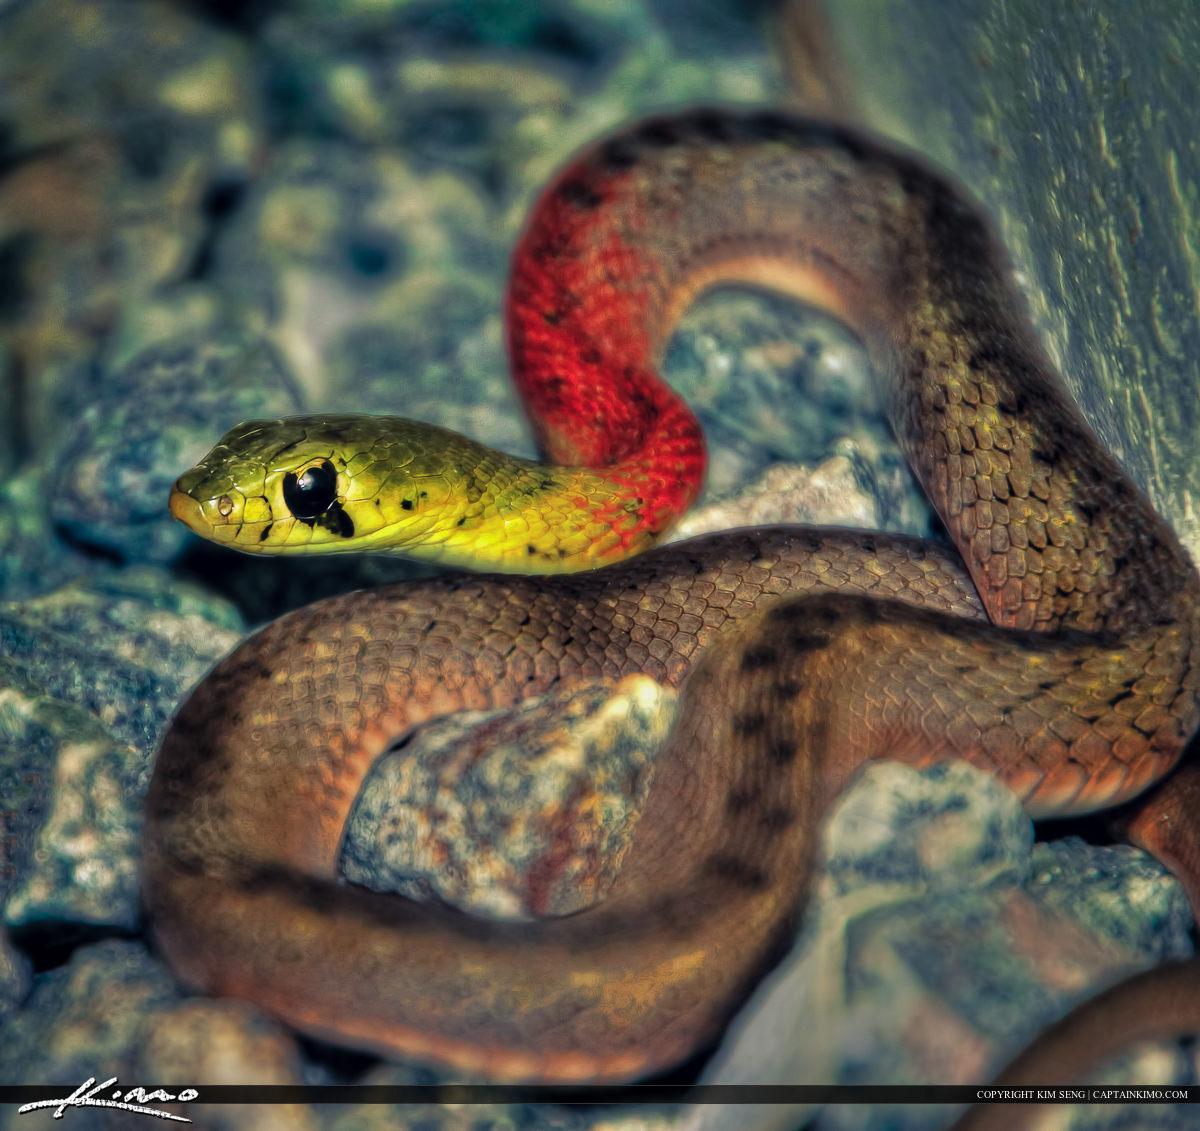 Red-necked Keelback Snake from Phuket Thailand